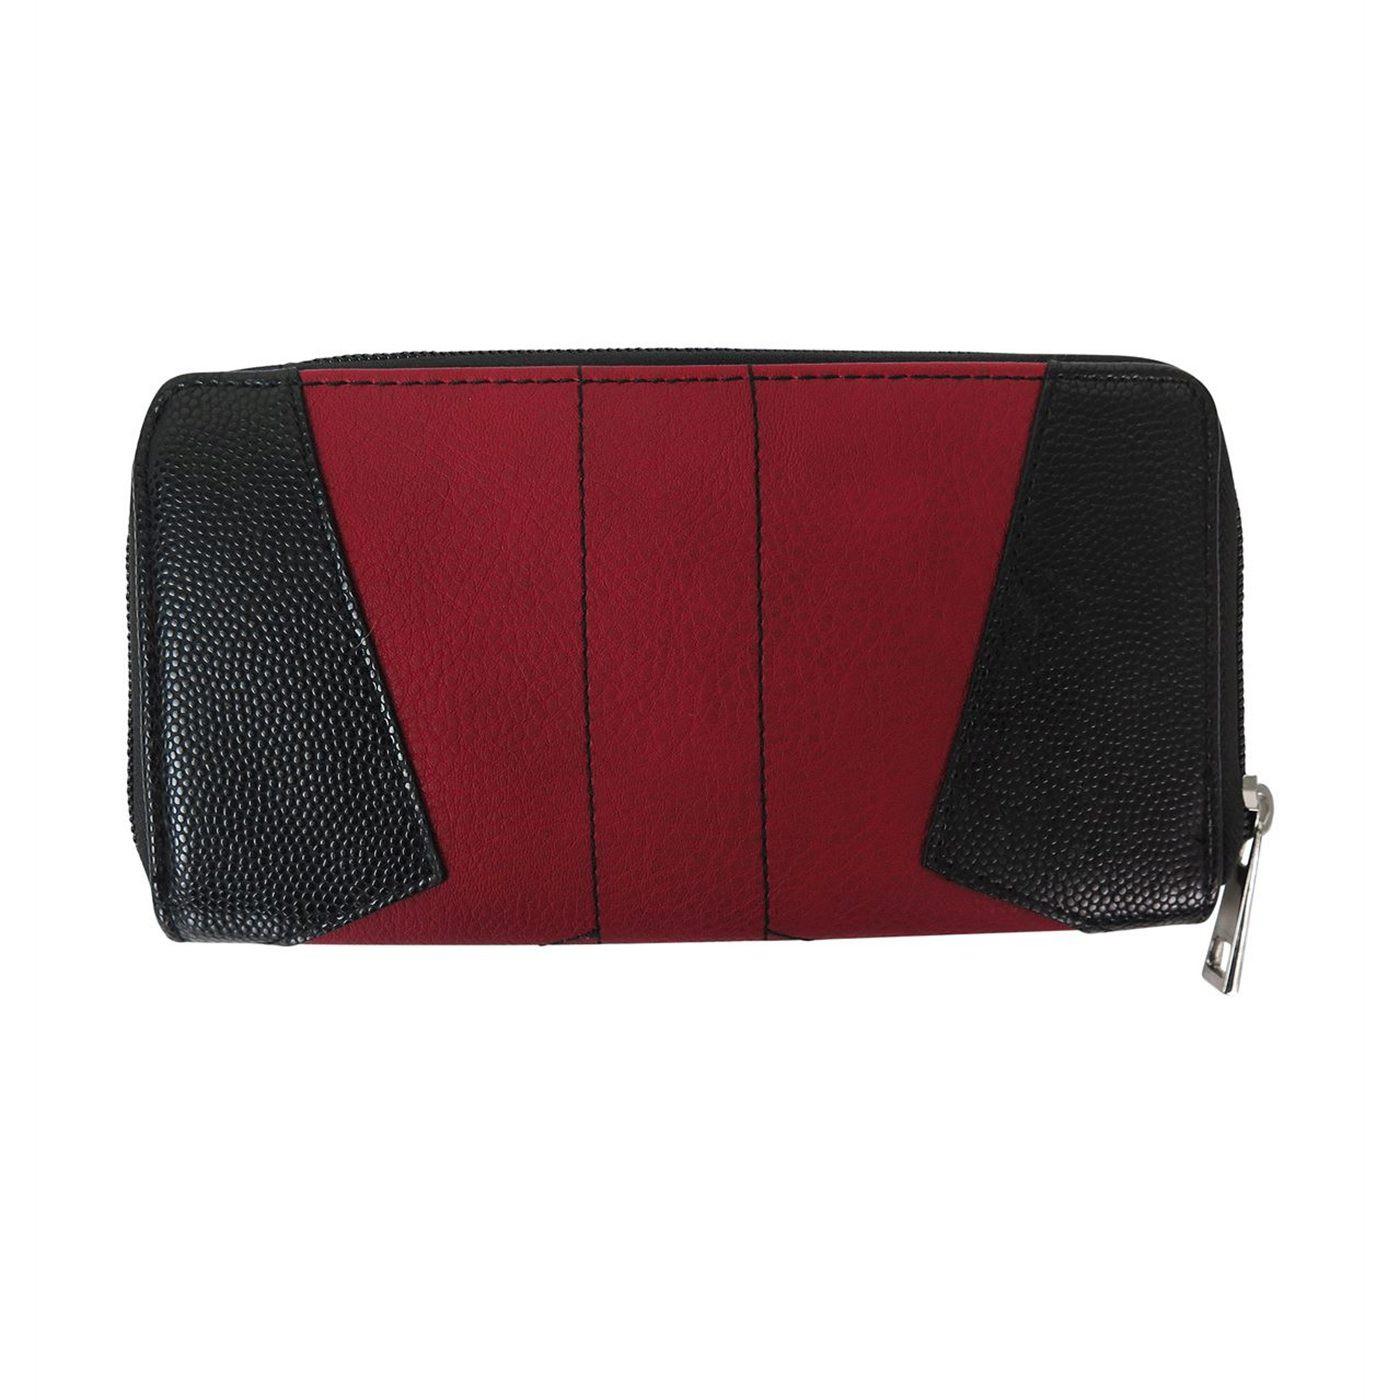 Deadpool Suit Up Women's Zipper Wallet